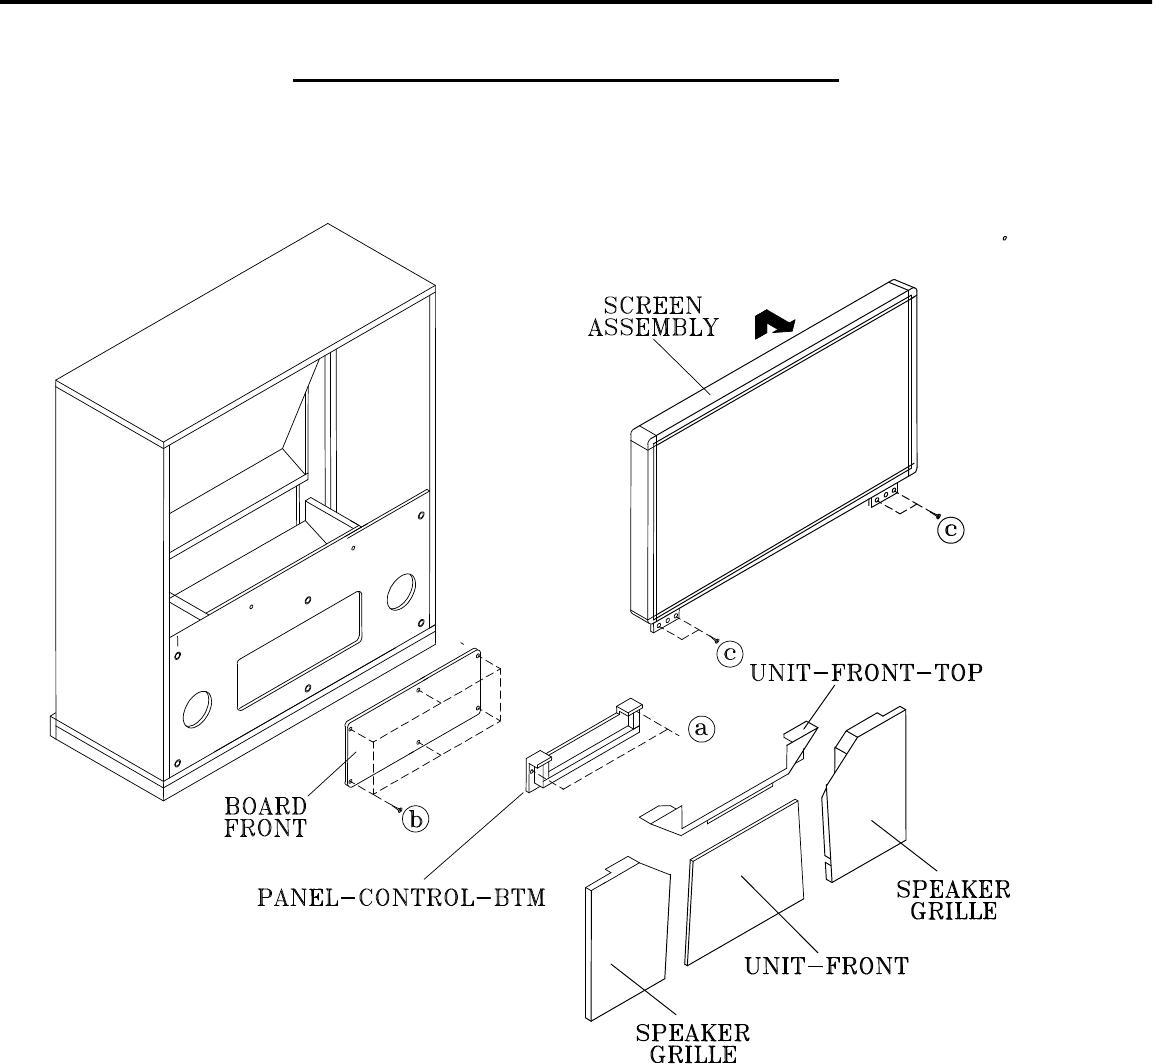 Mitsubishi Electronics WS-73513 WS-65713 / WS-73713